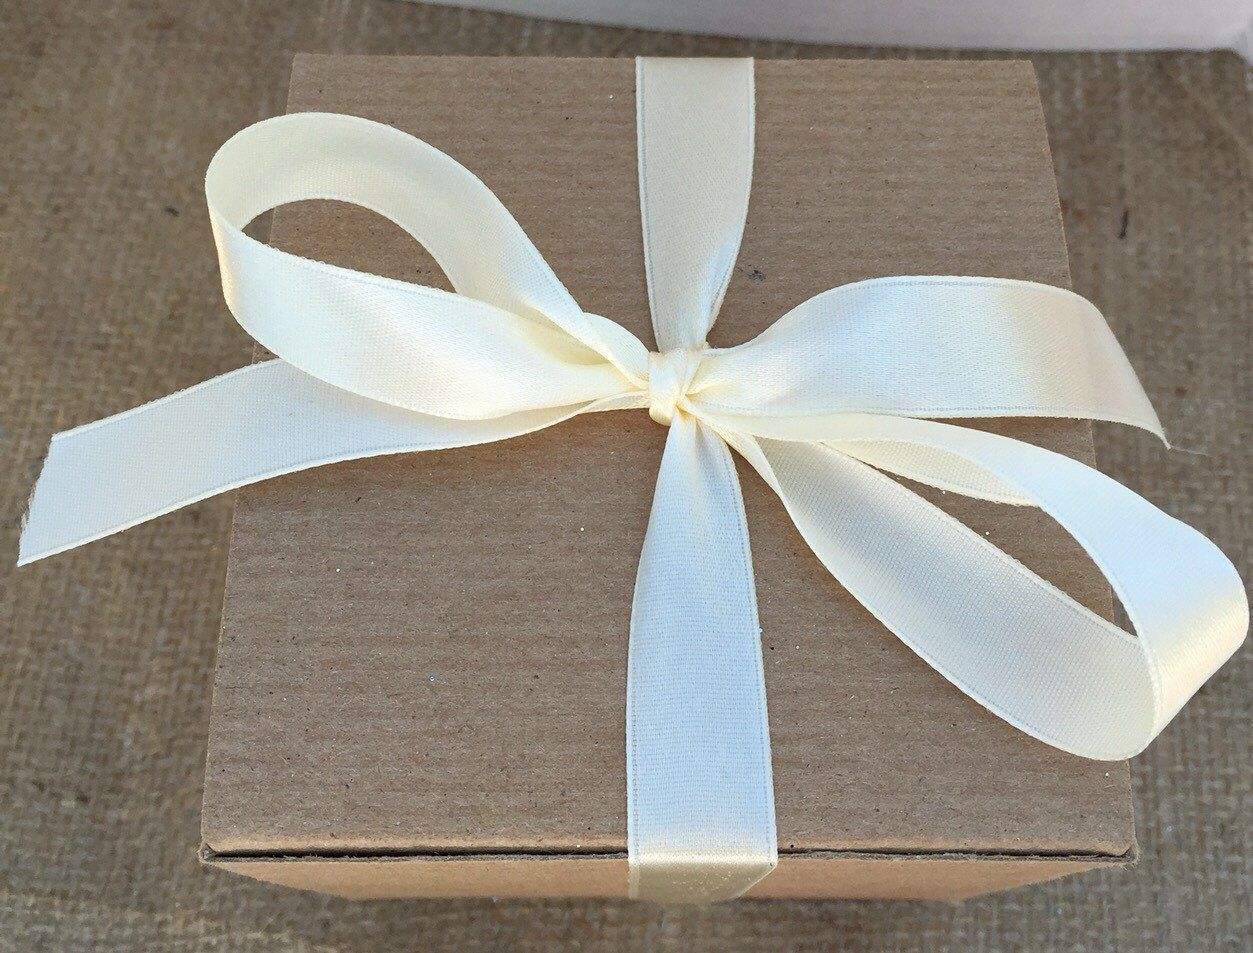 5 Yard Hand Made Fabric Ribbon Gift Wrapping Sewing Trim DIY Craft